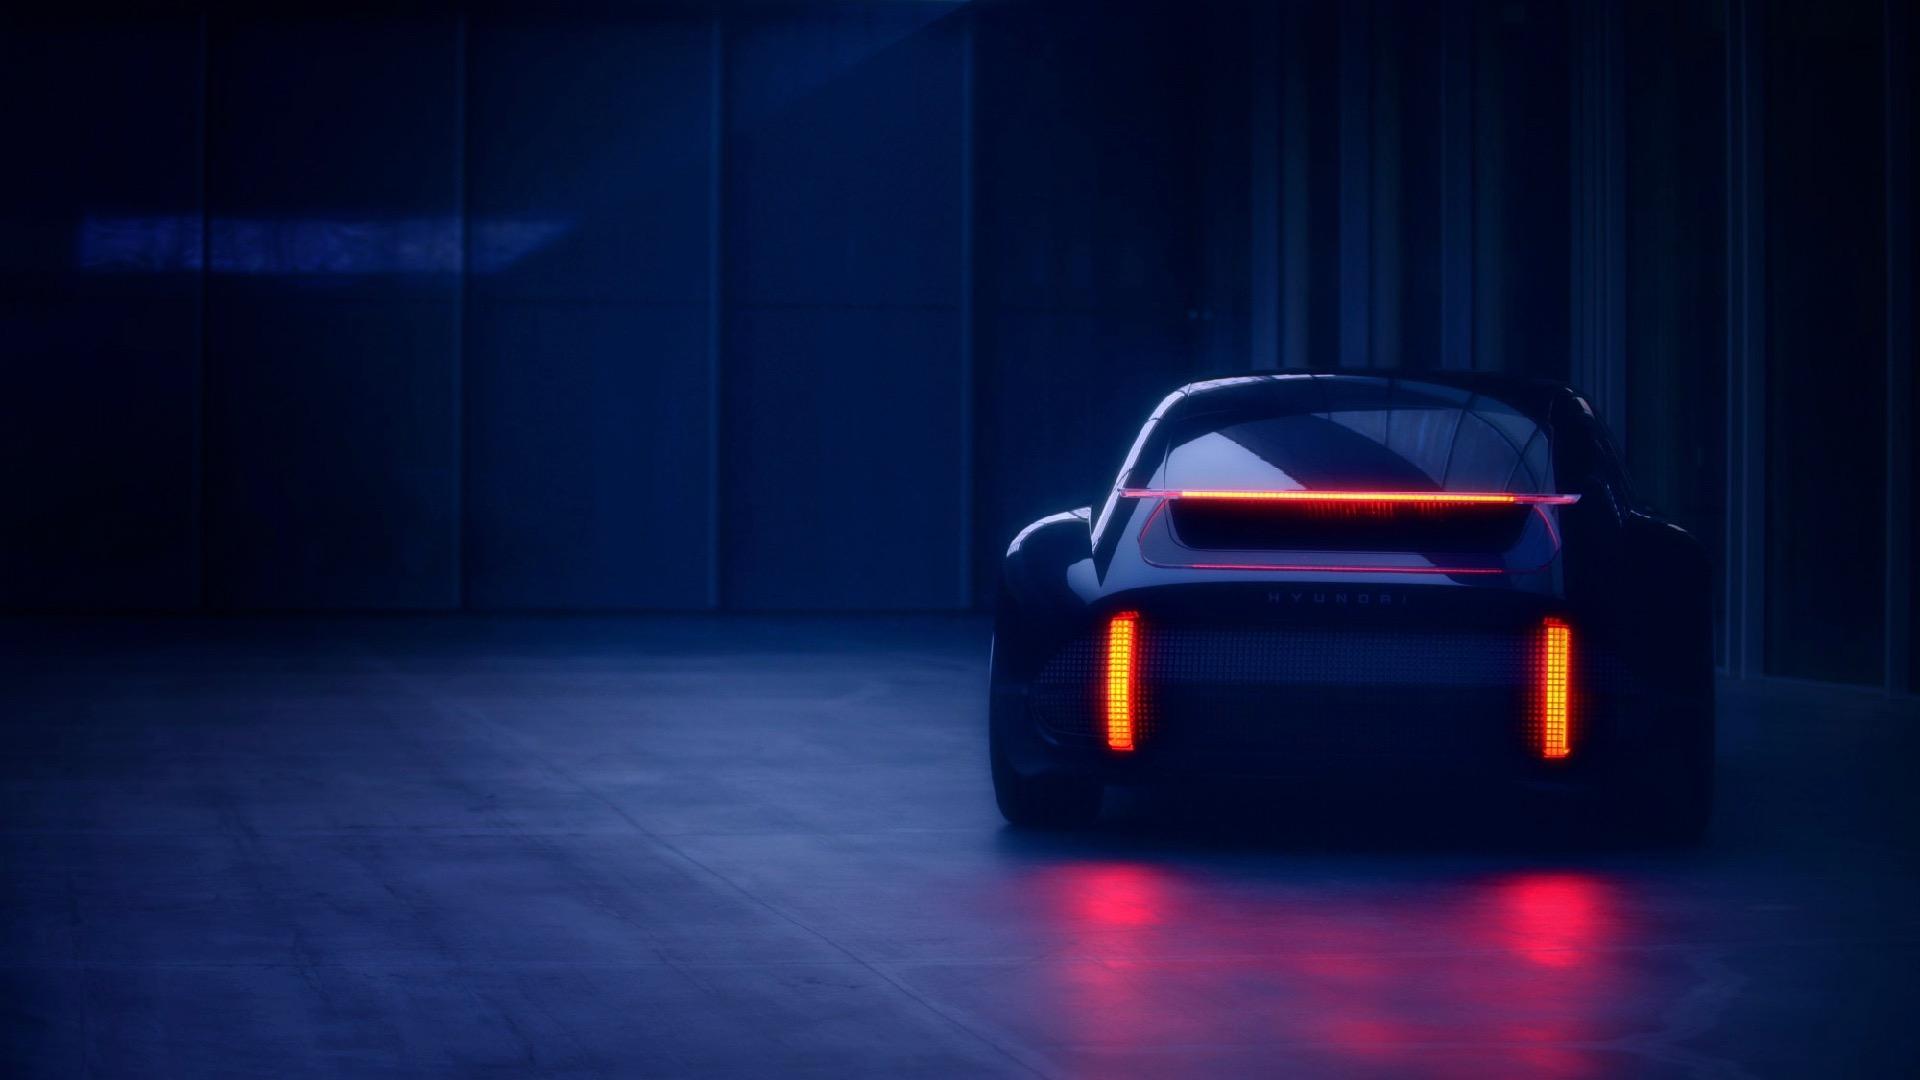 2020 Geneva auto show preview